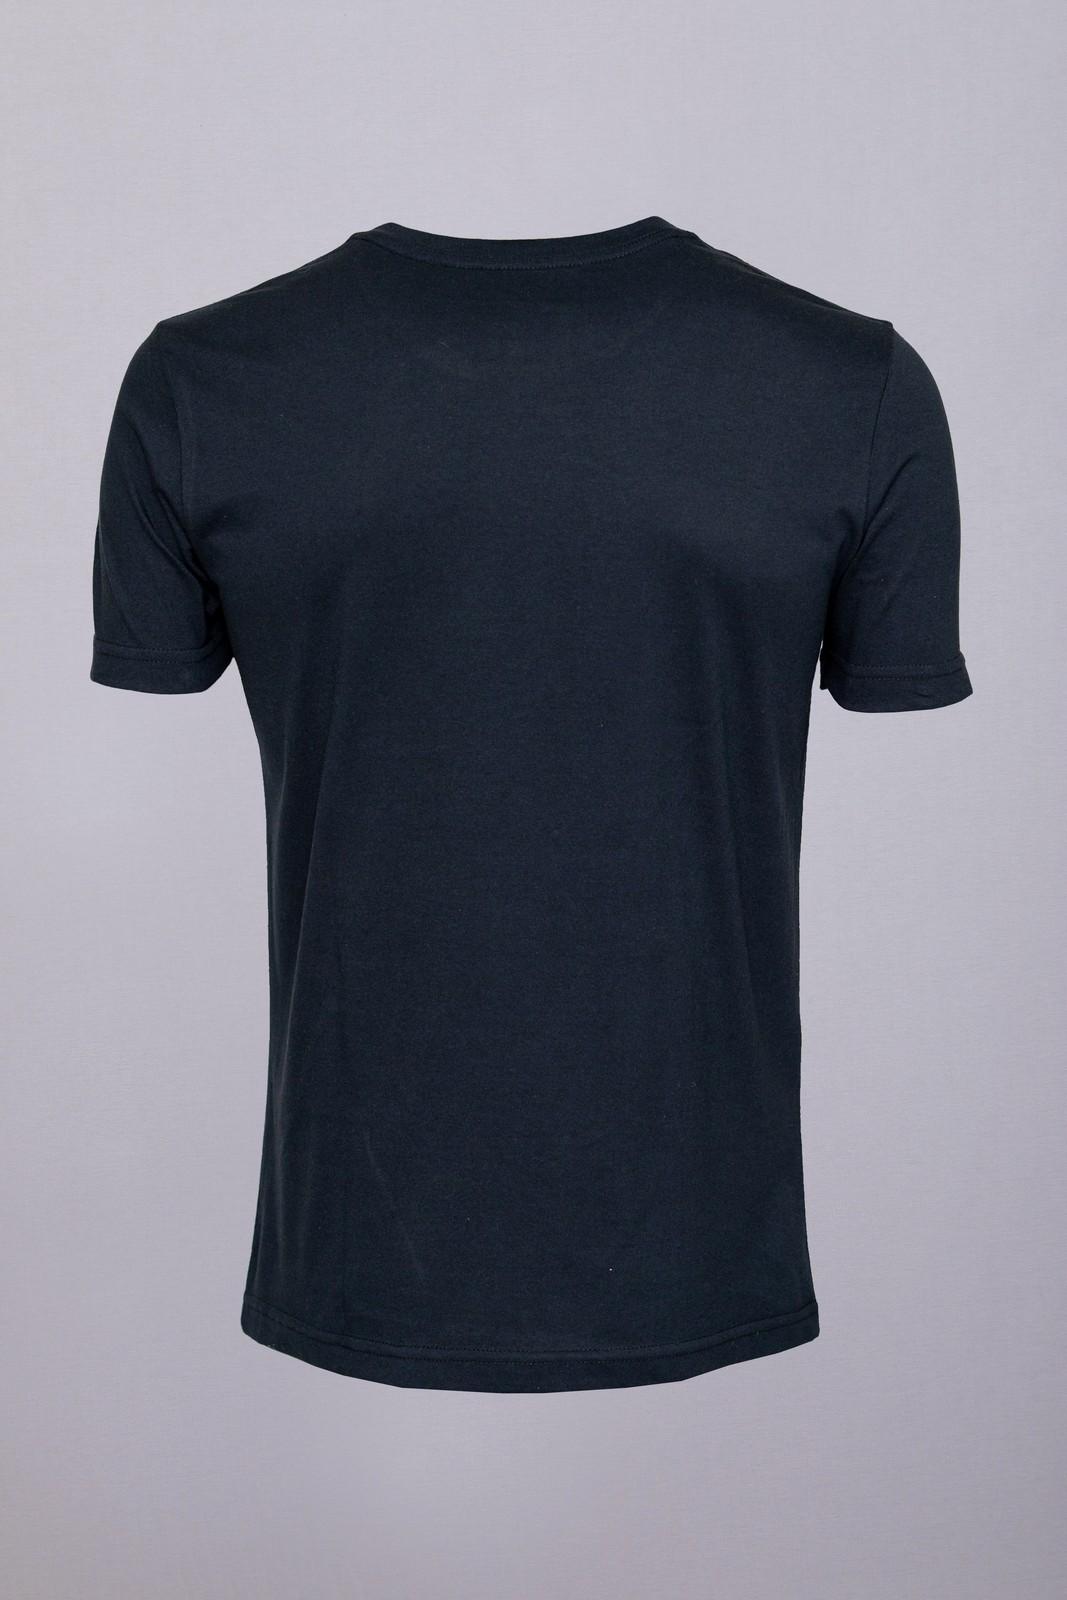 Camiseta CoolWave Voe Sem Ter Asas Preta